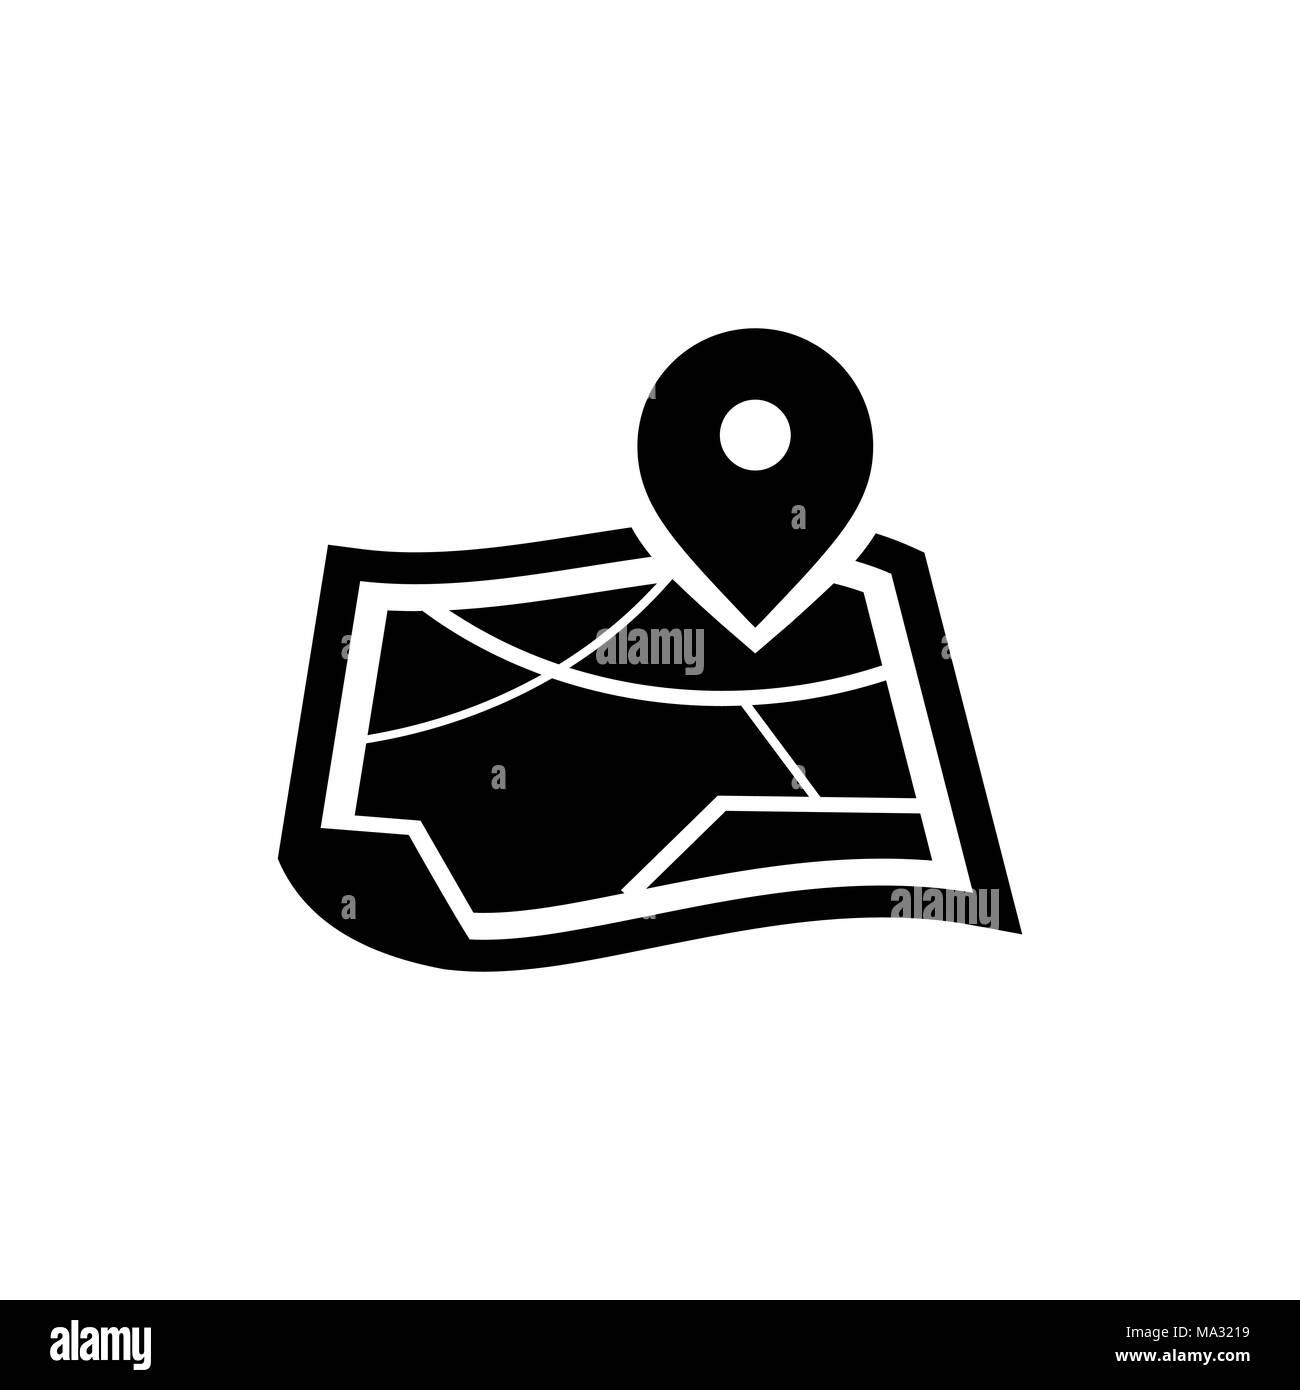 mod symbols, power symbols, crane symbols, sport symbols, baltimore symbols, cd symbols, race symbols, state symbols, real symbols, cook symbols, on map comp symbol